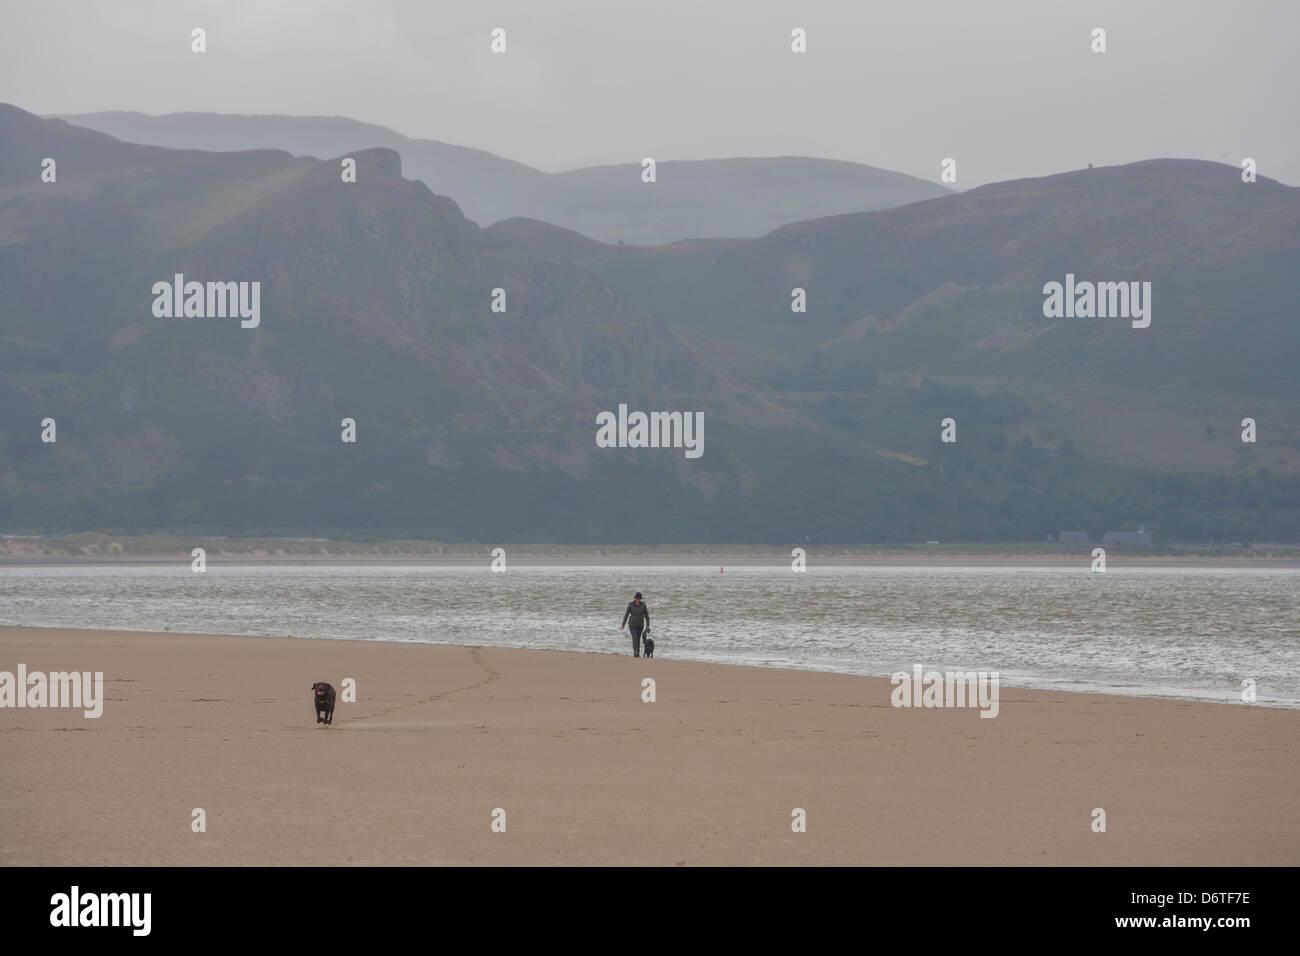 seaside coast pier jetty promenade - Stock Image